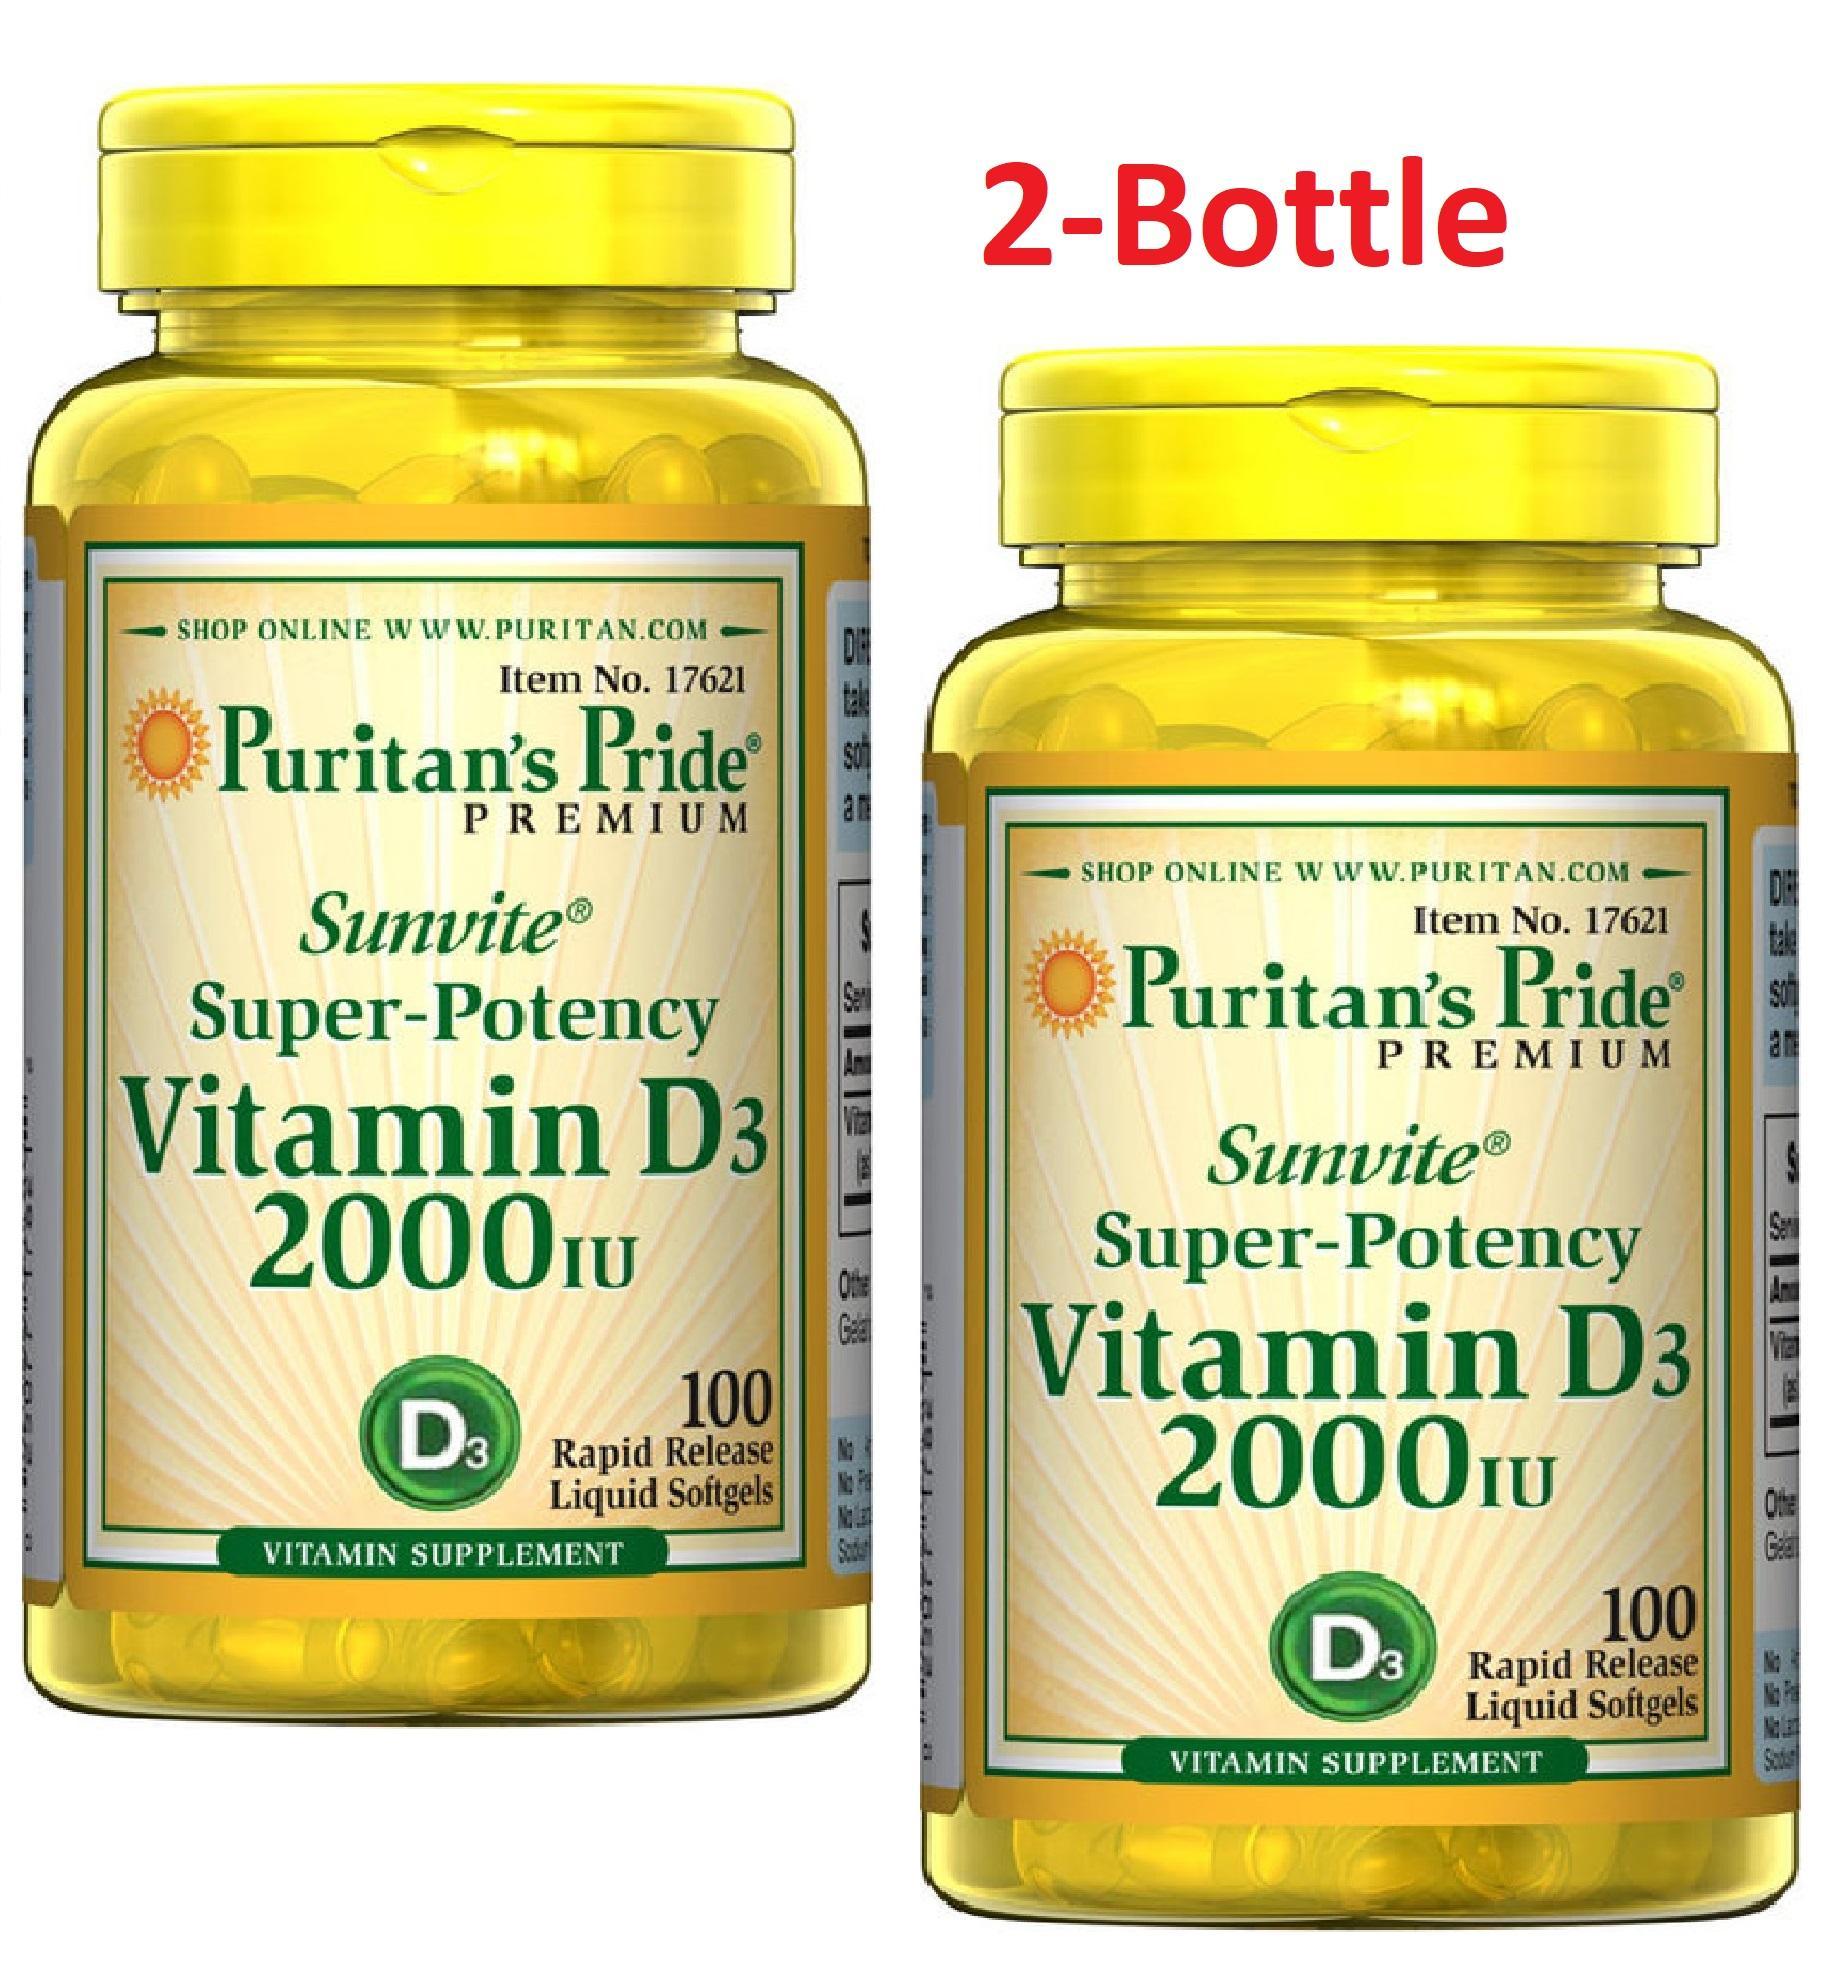 Bone Care Brands Supplements On Sale Prices Set Reviews Puritans Pride Calcium Magnesium Citrate Plus Vitamin D 100 Capsules D3 2000 Iu Softgels 2 Bottle